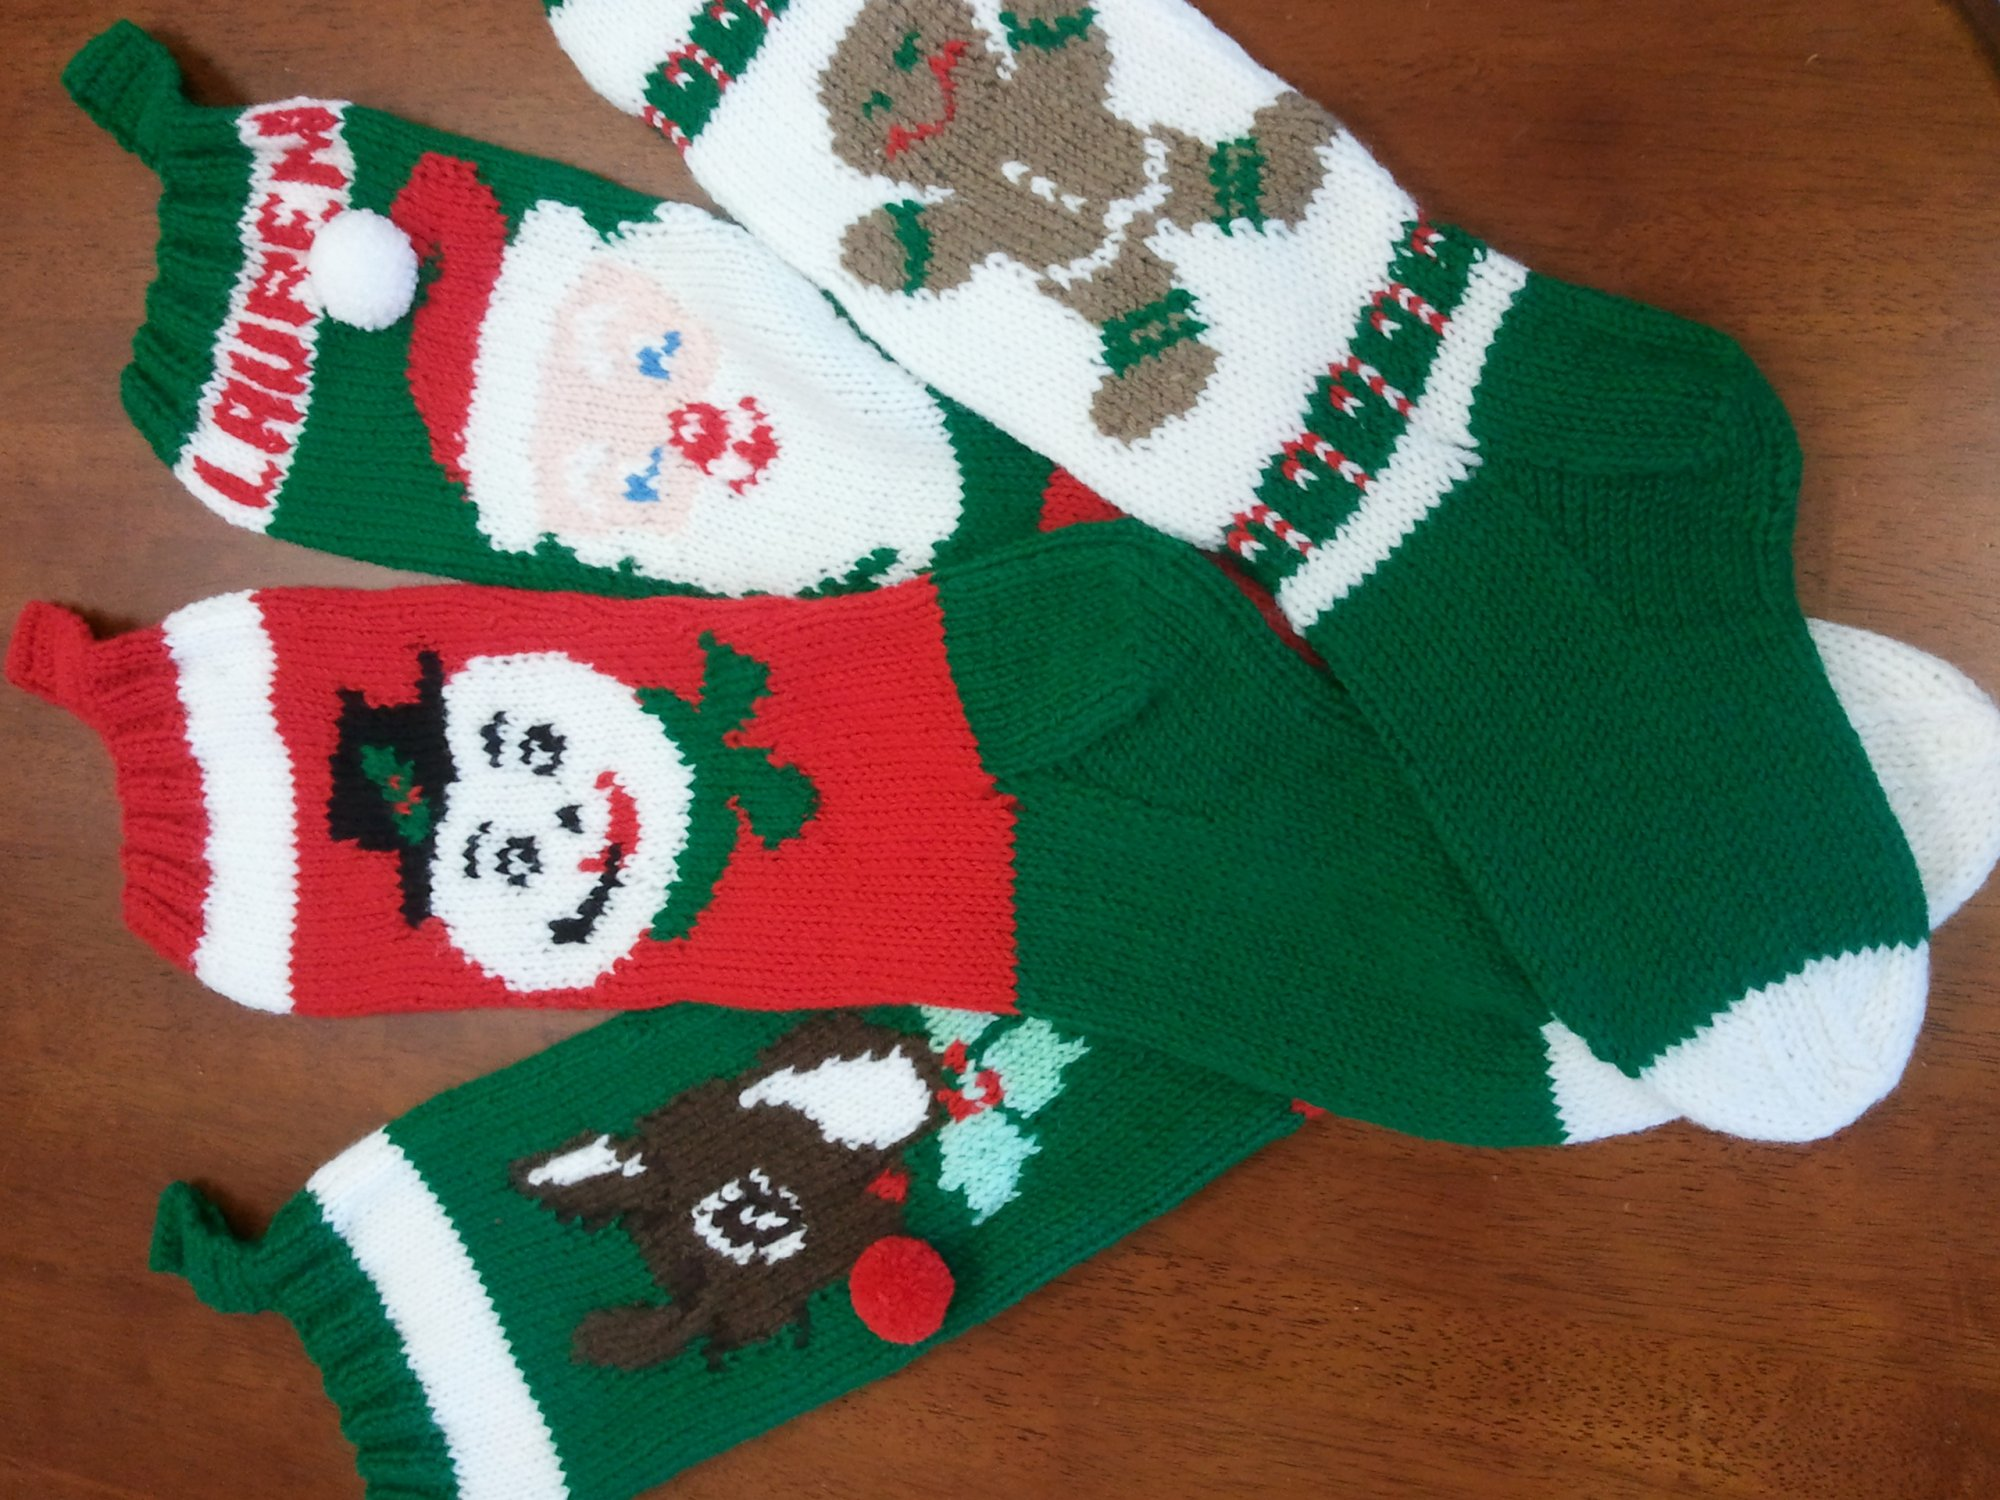 805-Knitting: Knitted Christmas Stocking